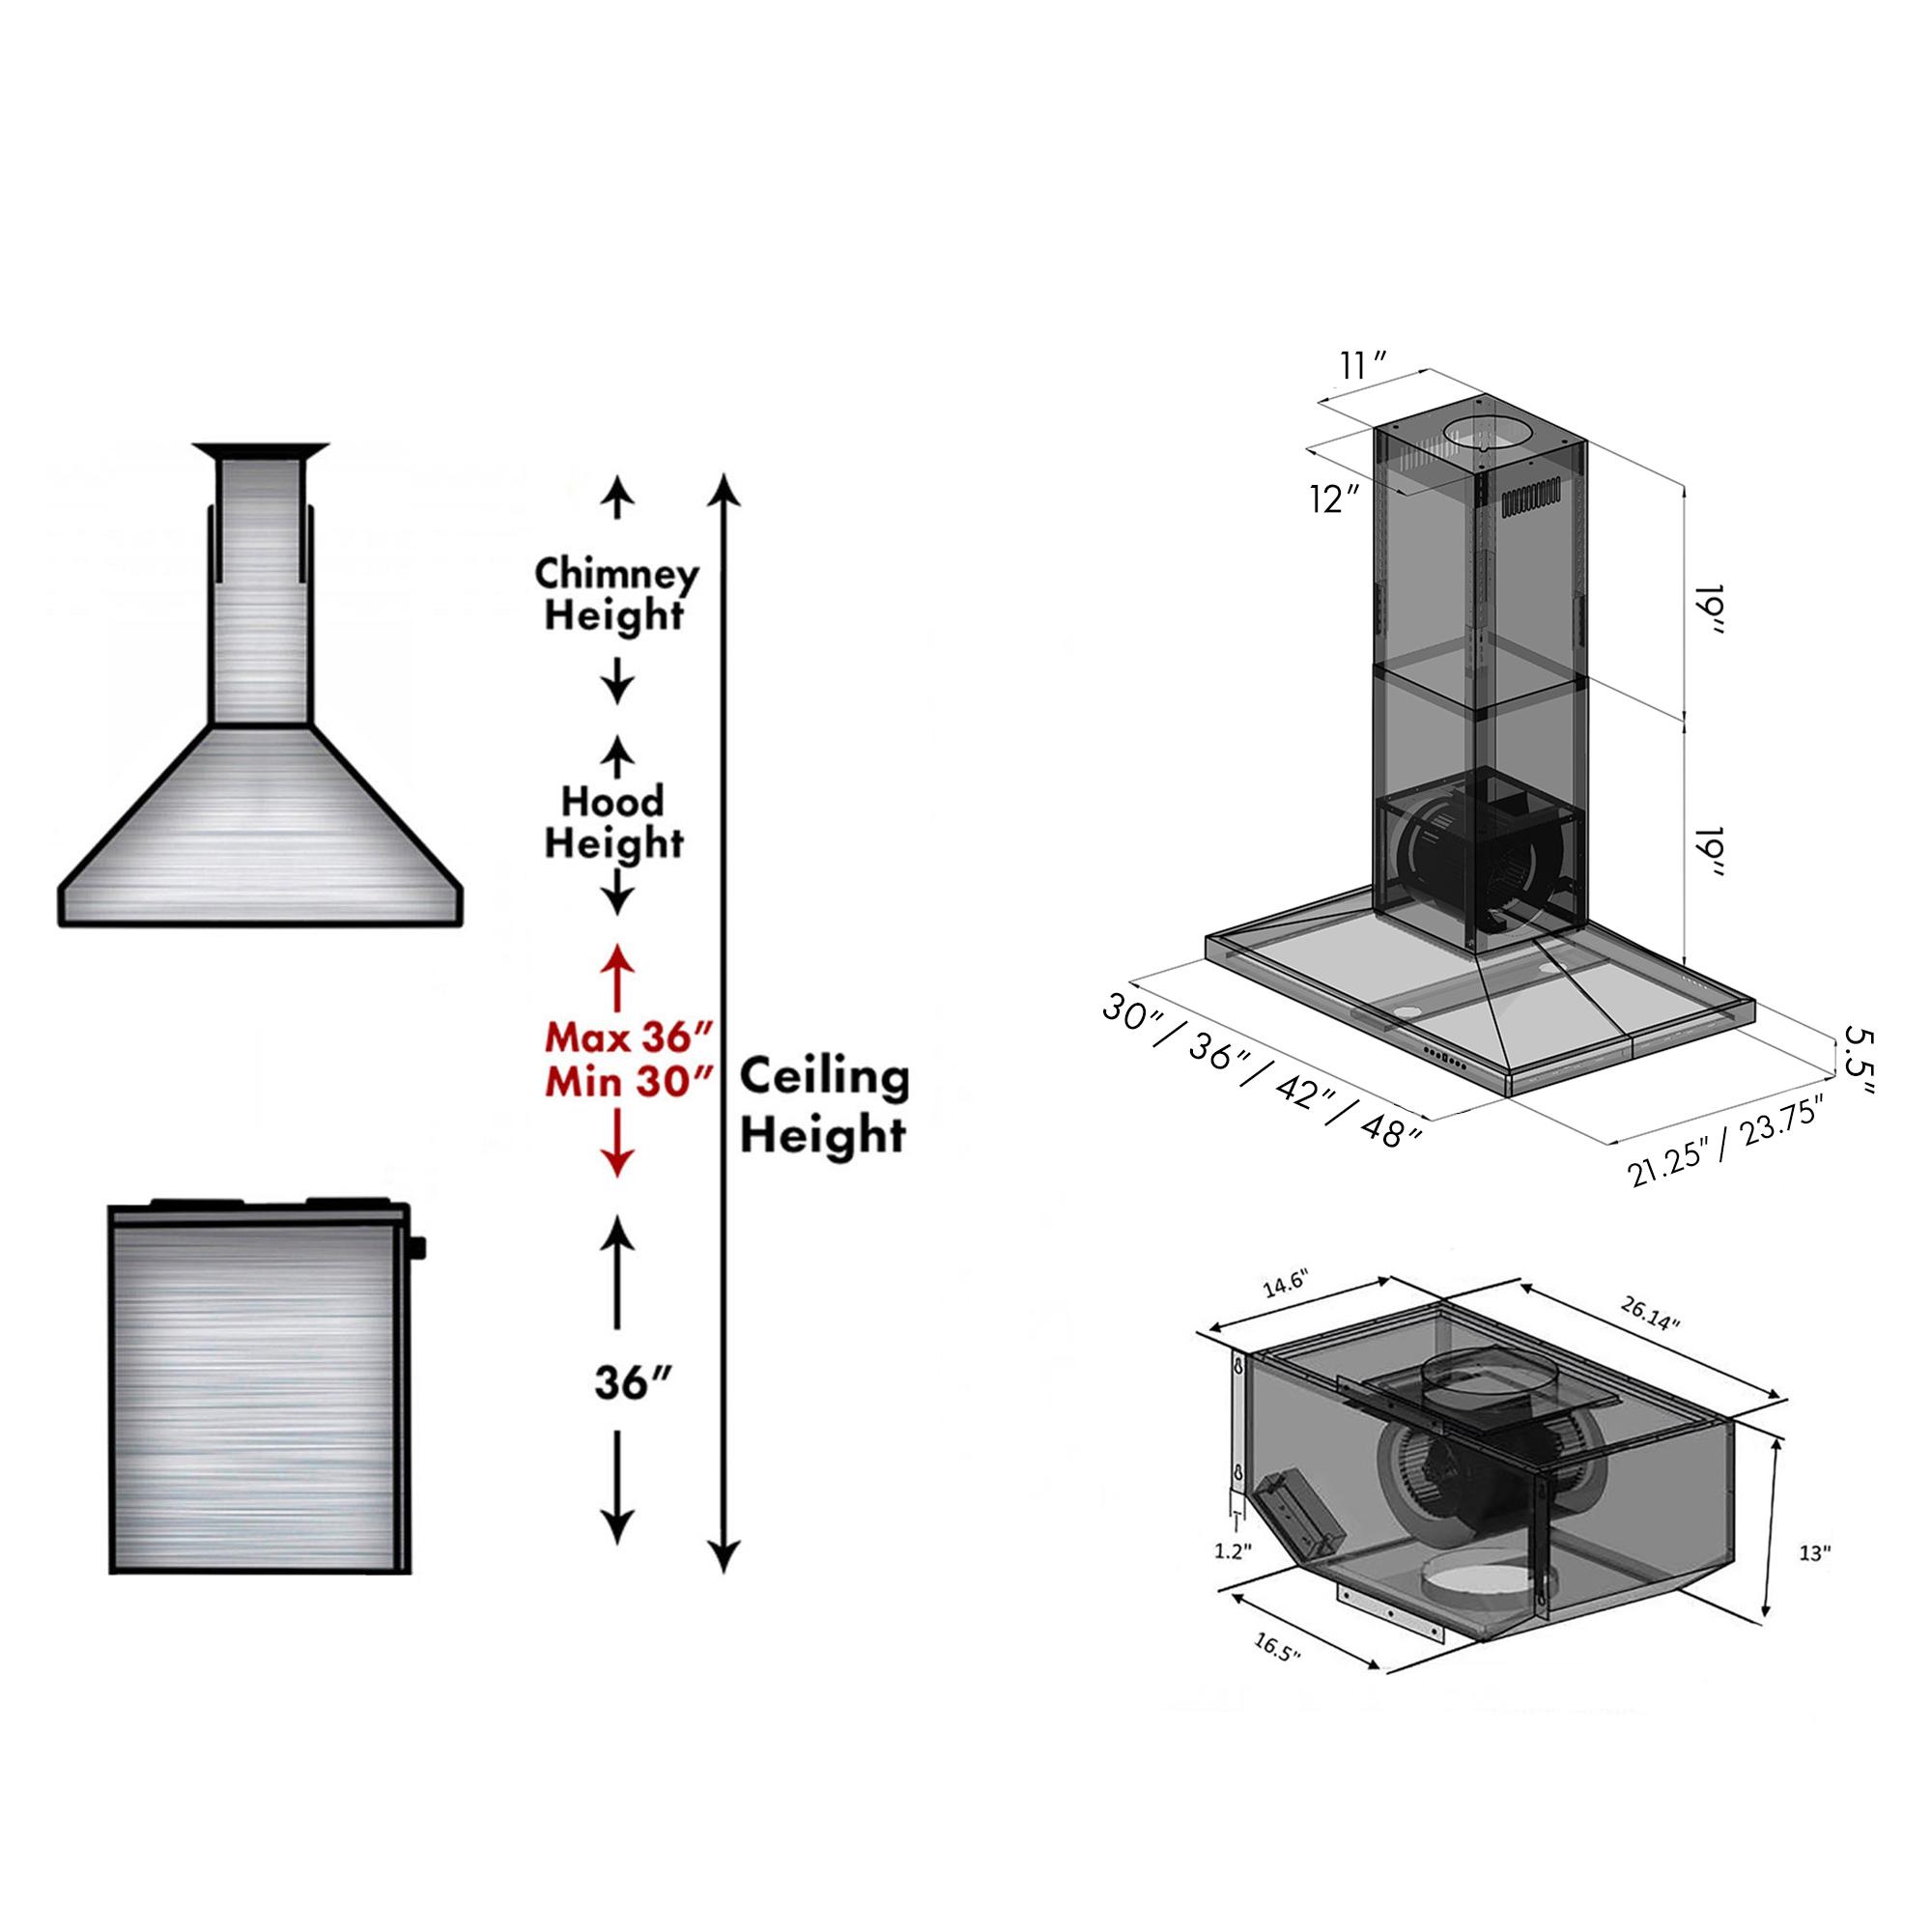 zline-stainless-steel-island-range-hood-GL2i-R-graphic-ZLK.jpg